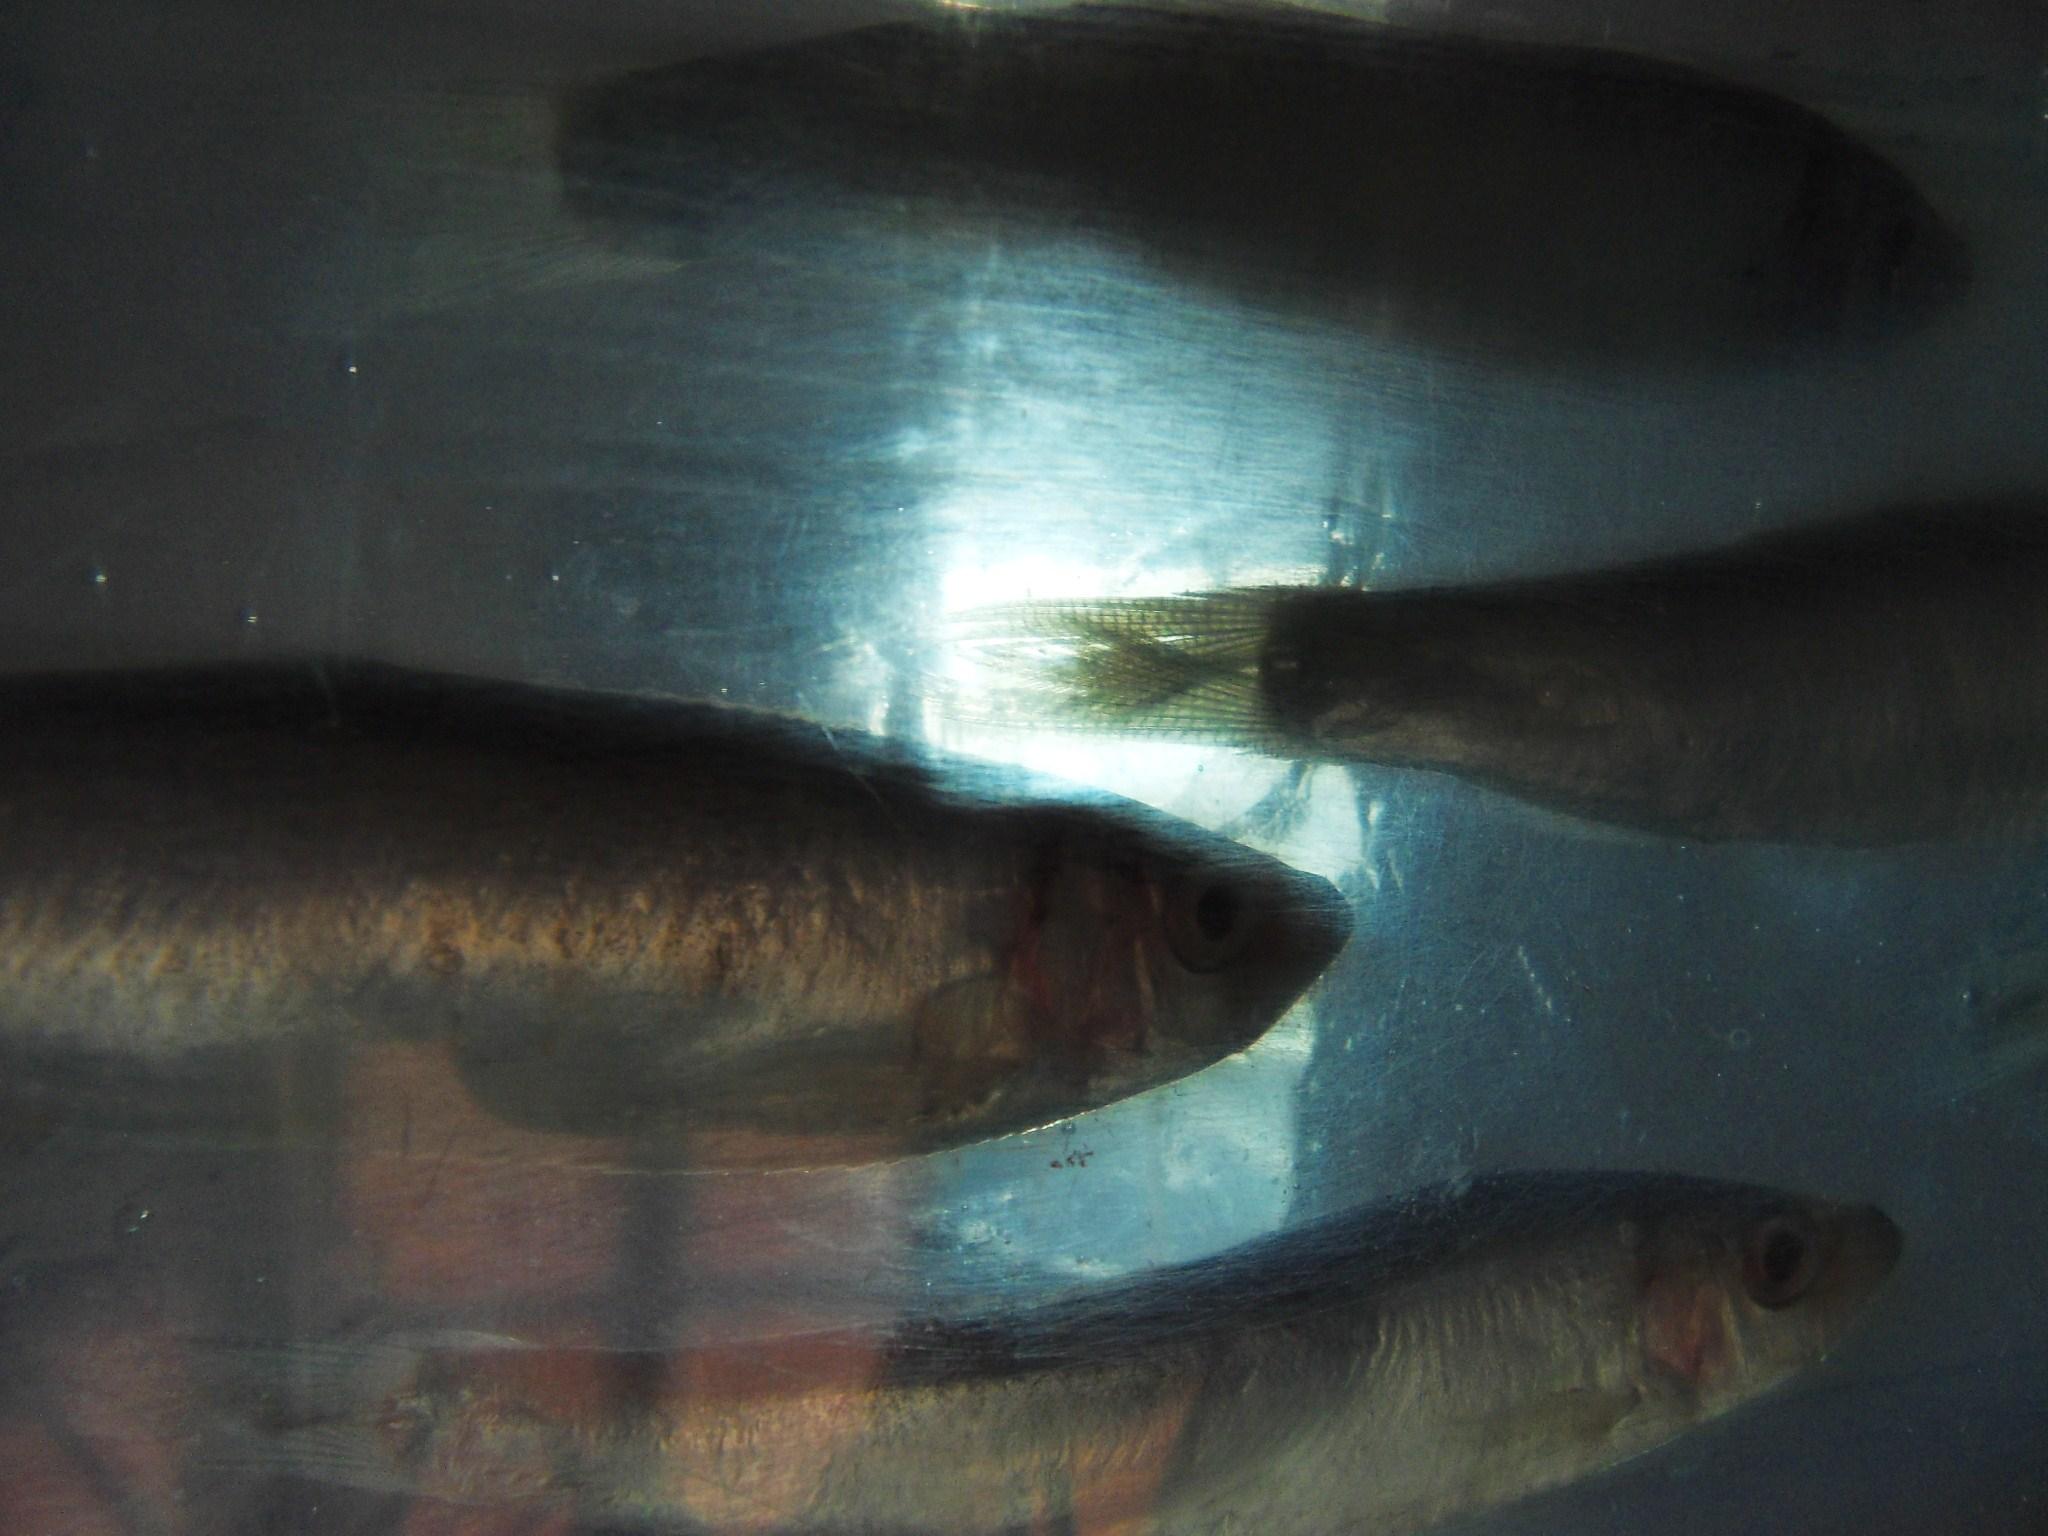 193 window thru fish